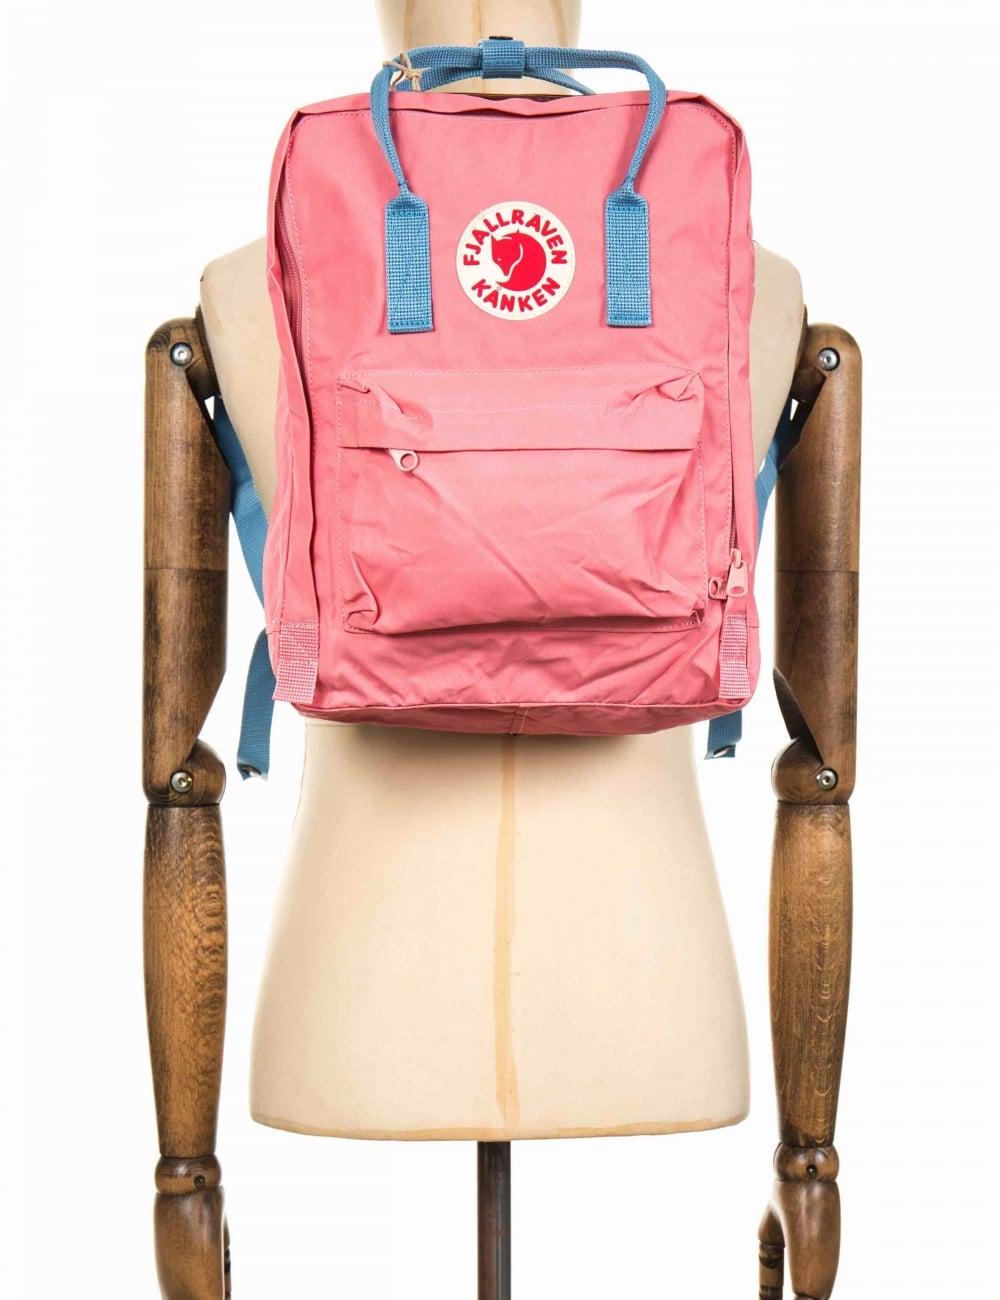 40423c99a Fjallraven Kanken Classic Backpack - Pink/Air Blue - Accessories ...